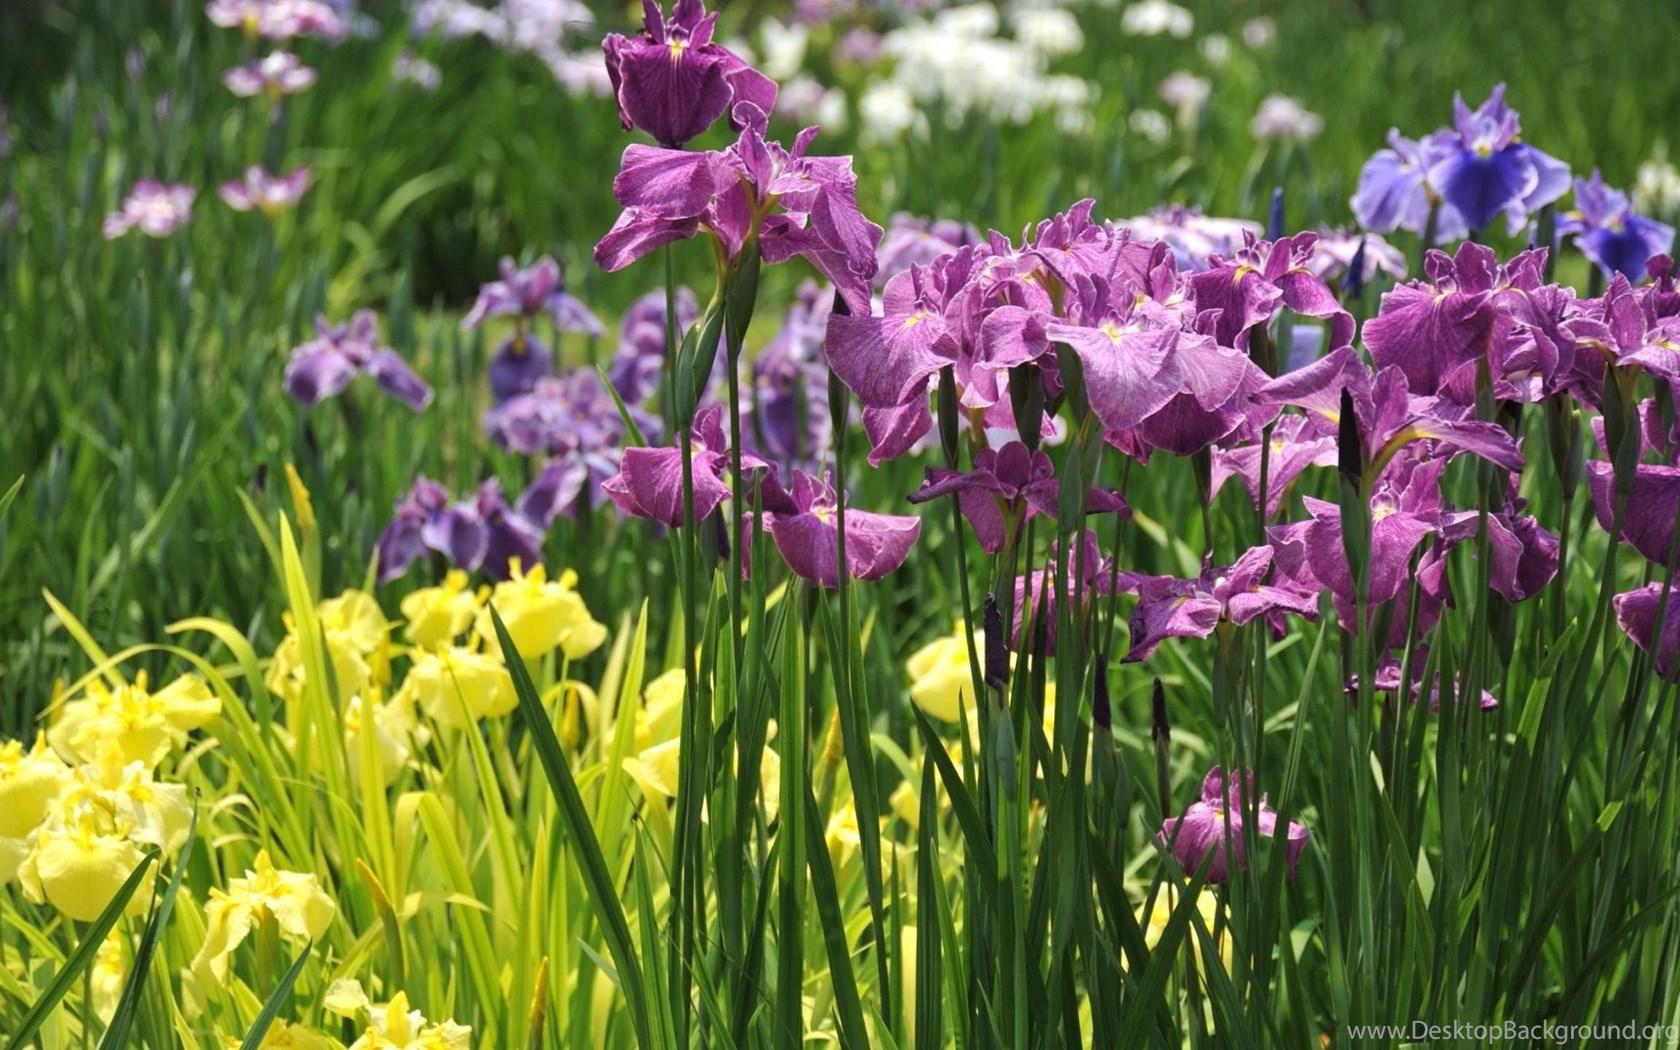 шмель,ирис,цветок,лето  № 529611 бесплатно